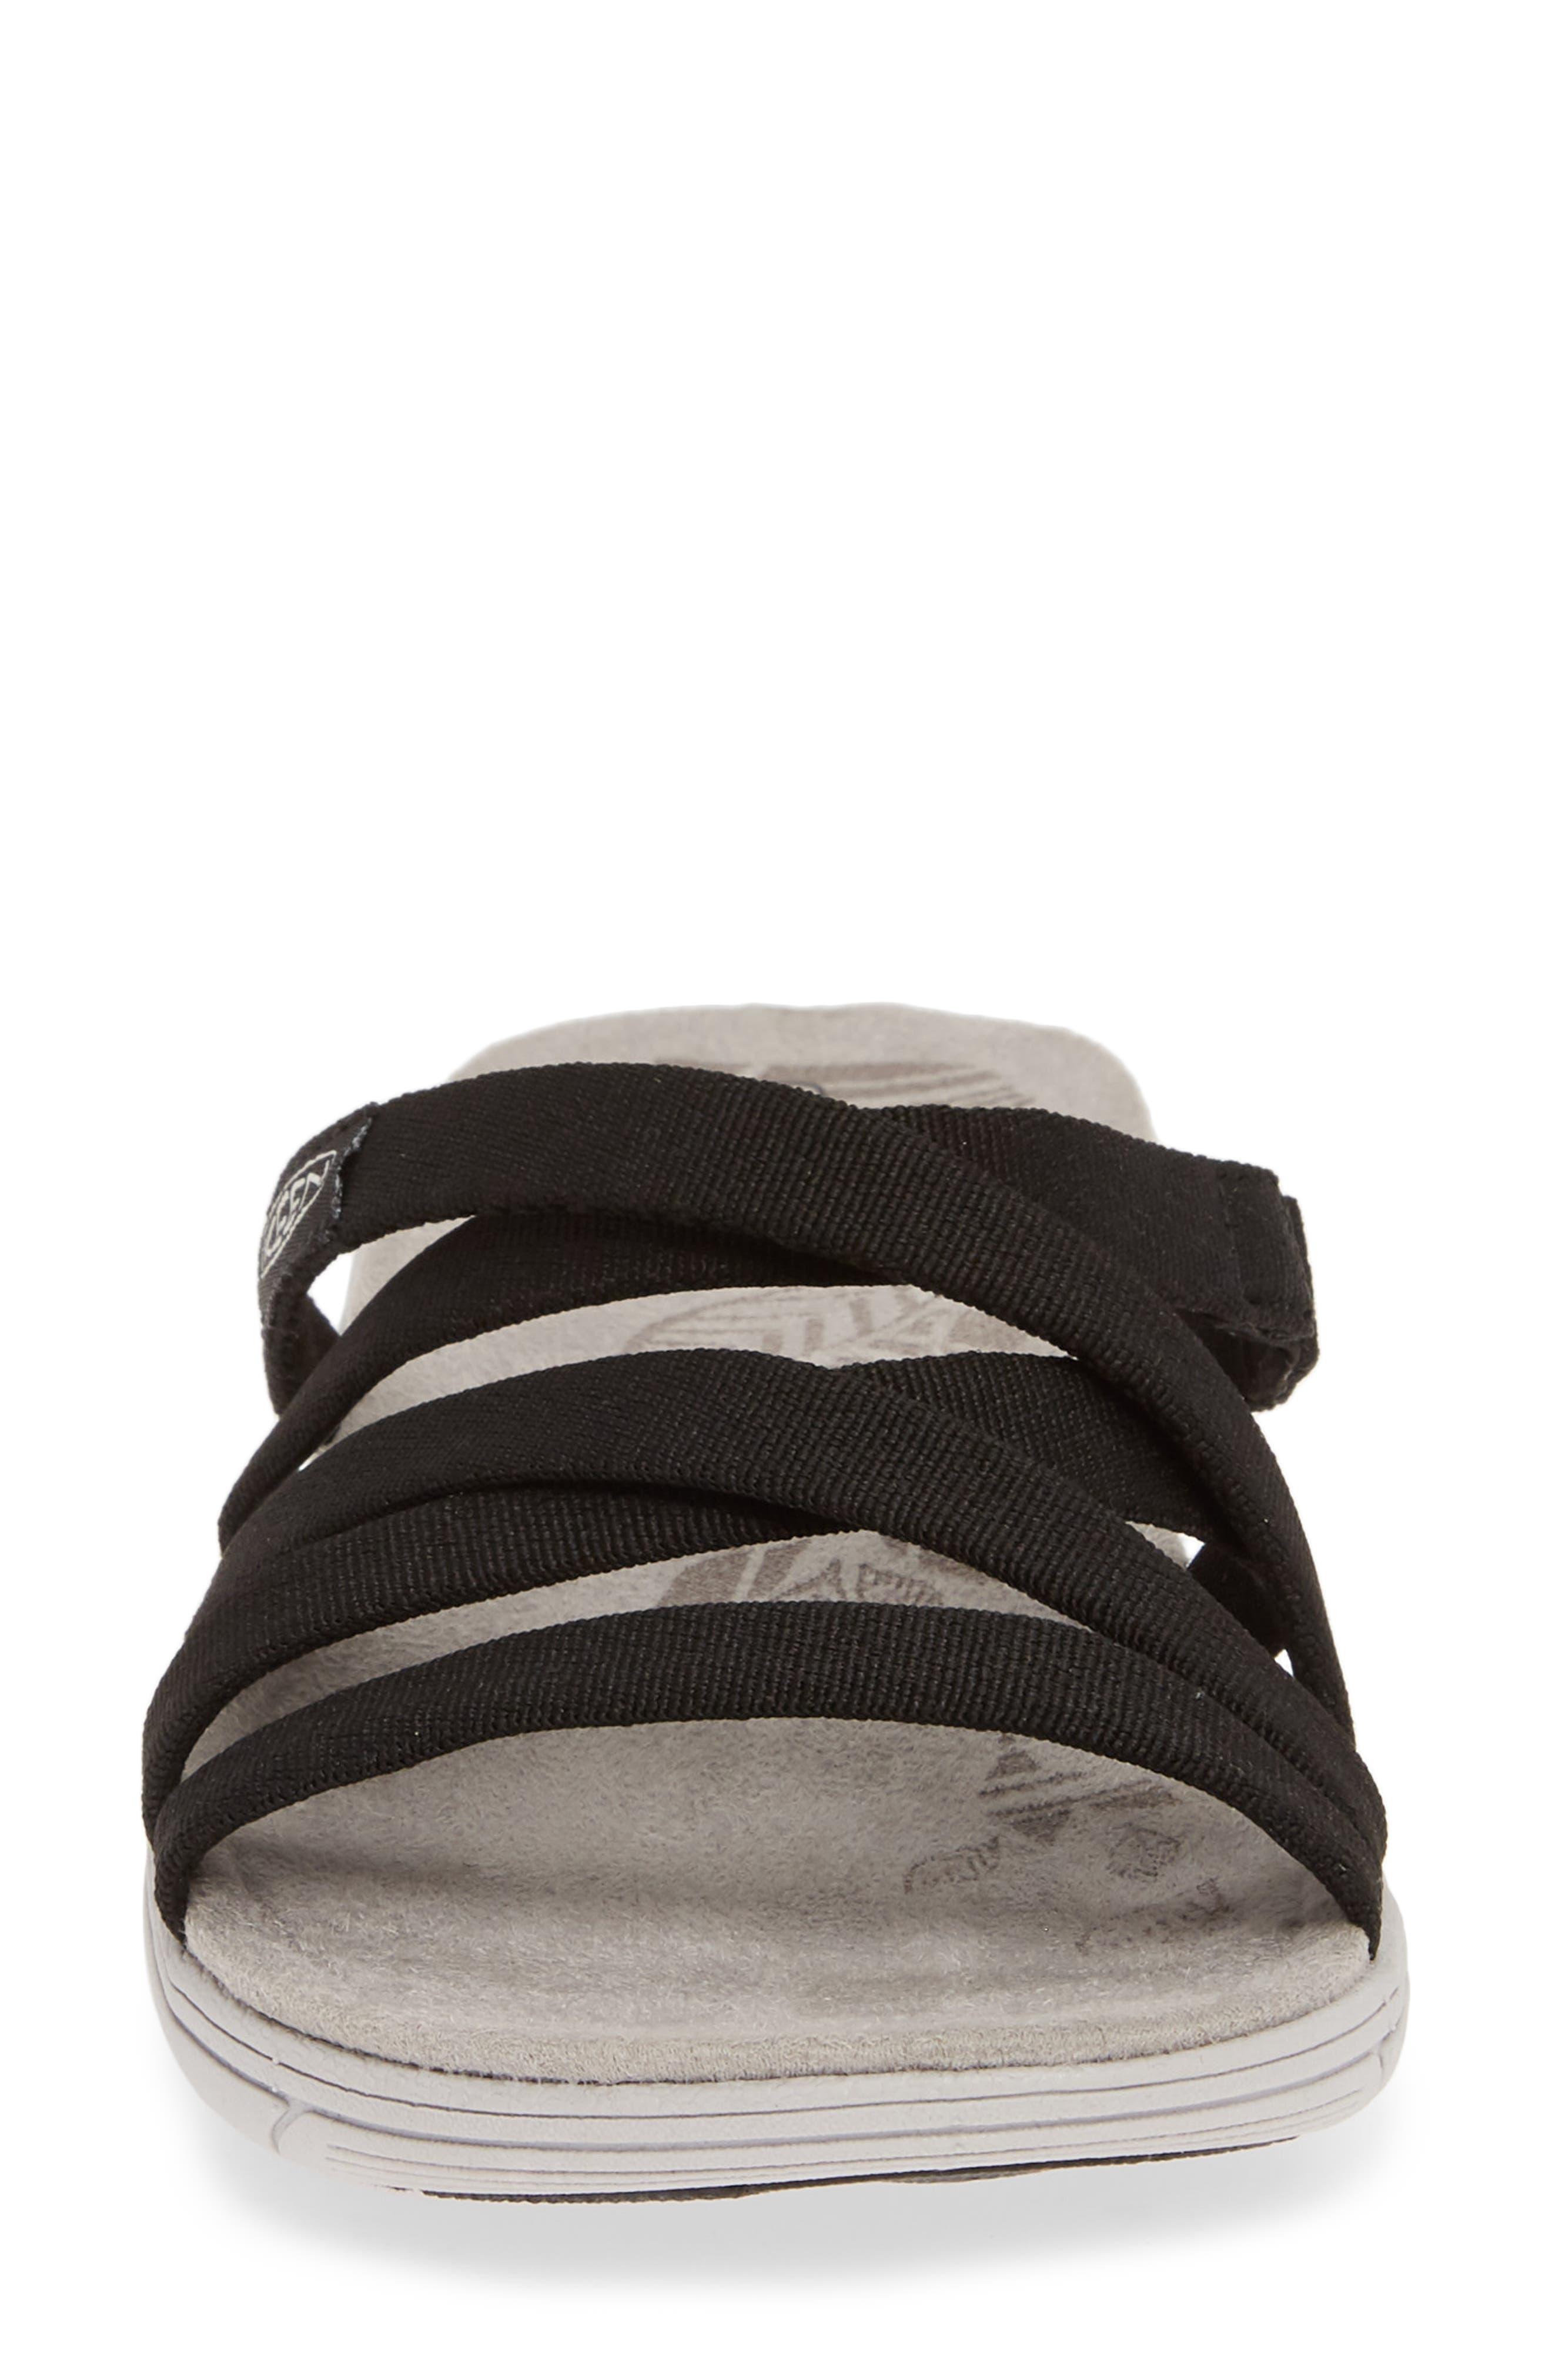 KEEN, Damaya Slide Sandal, Alternate thumbnail 4, color, BLACK/ VAPOR BLUE FABRIC